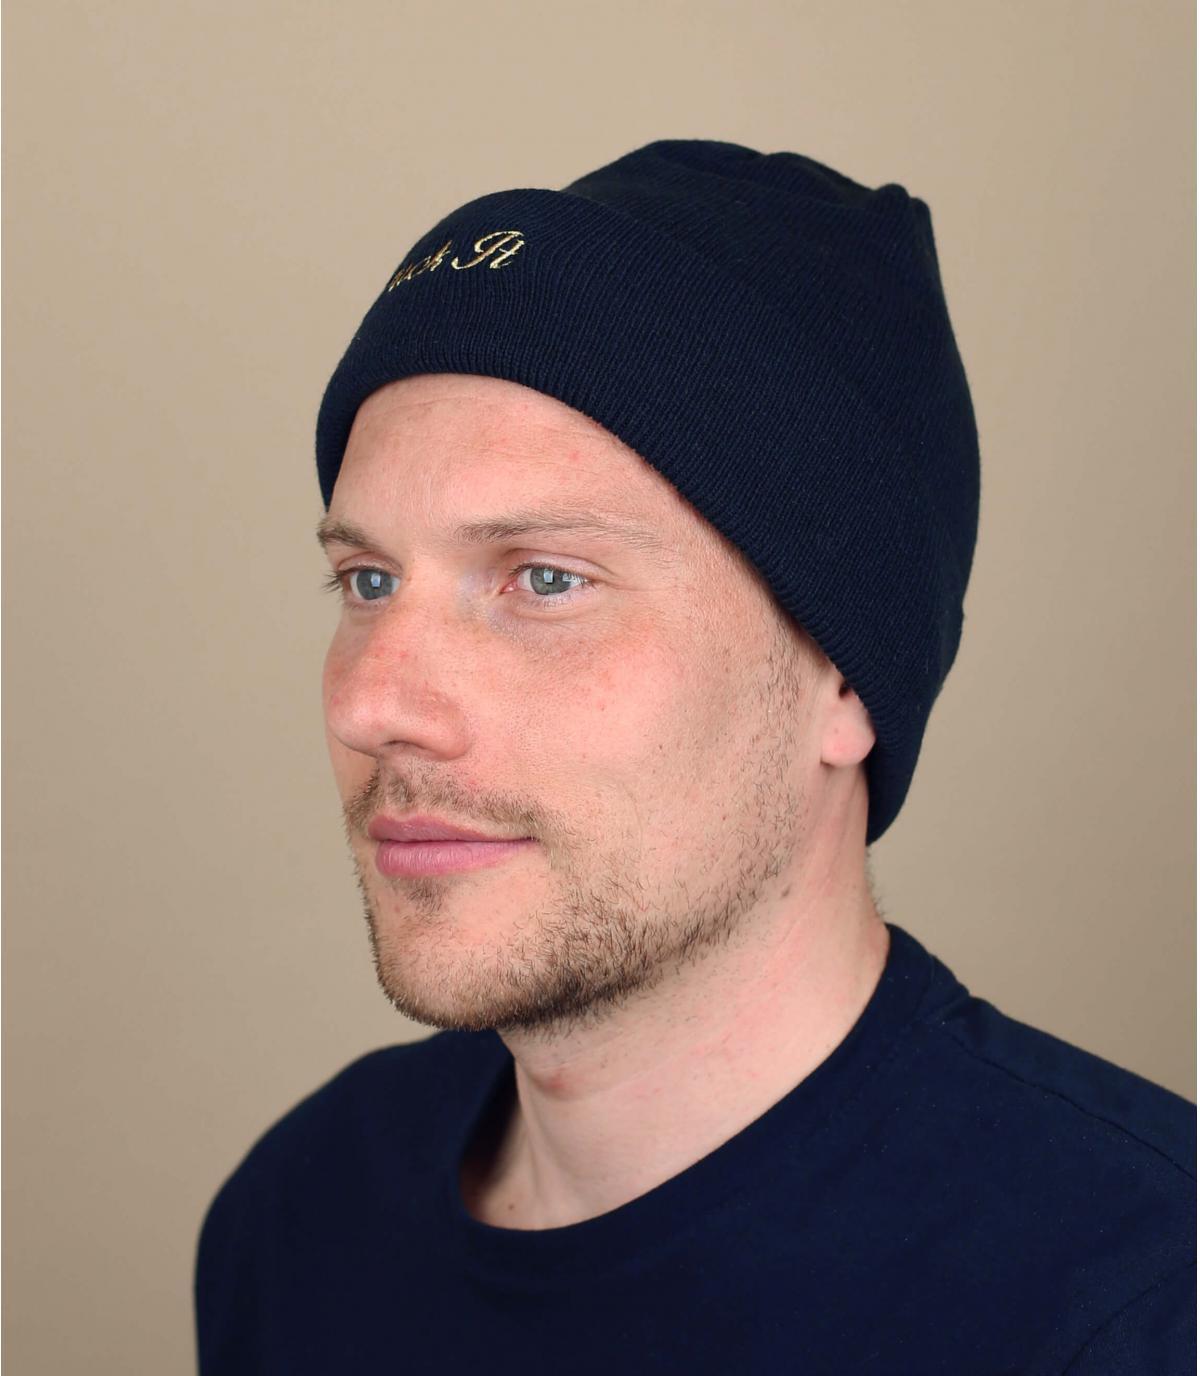 Huf omkeerbare hoed blauw